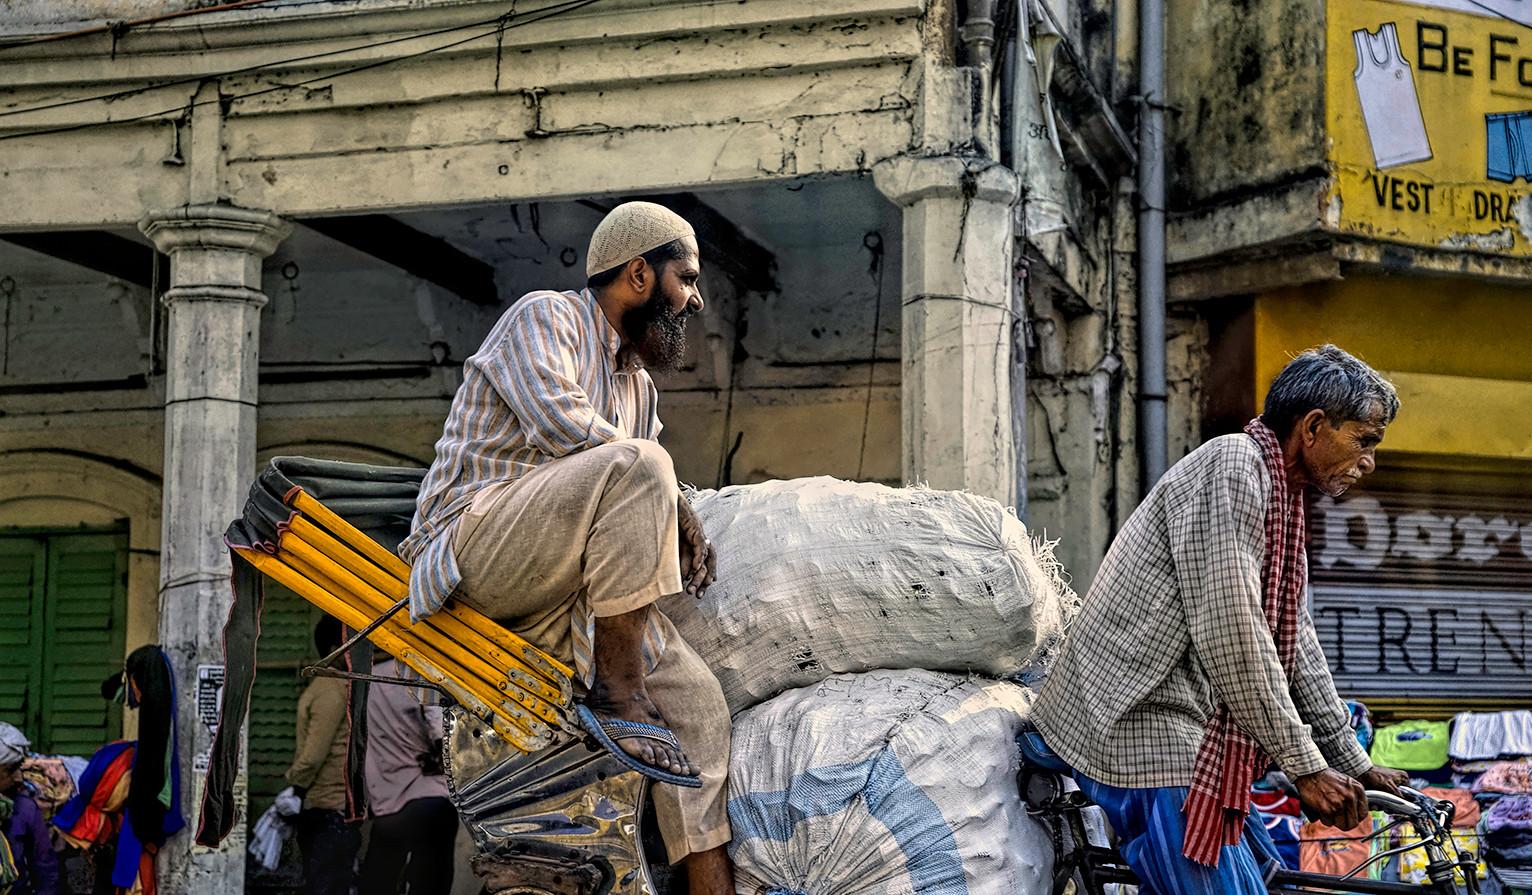 Heading to market in Old Delhi, India